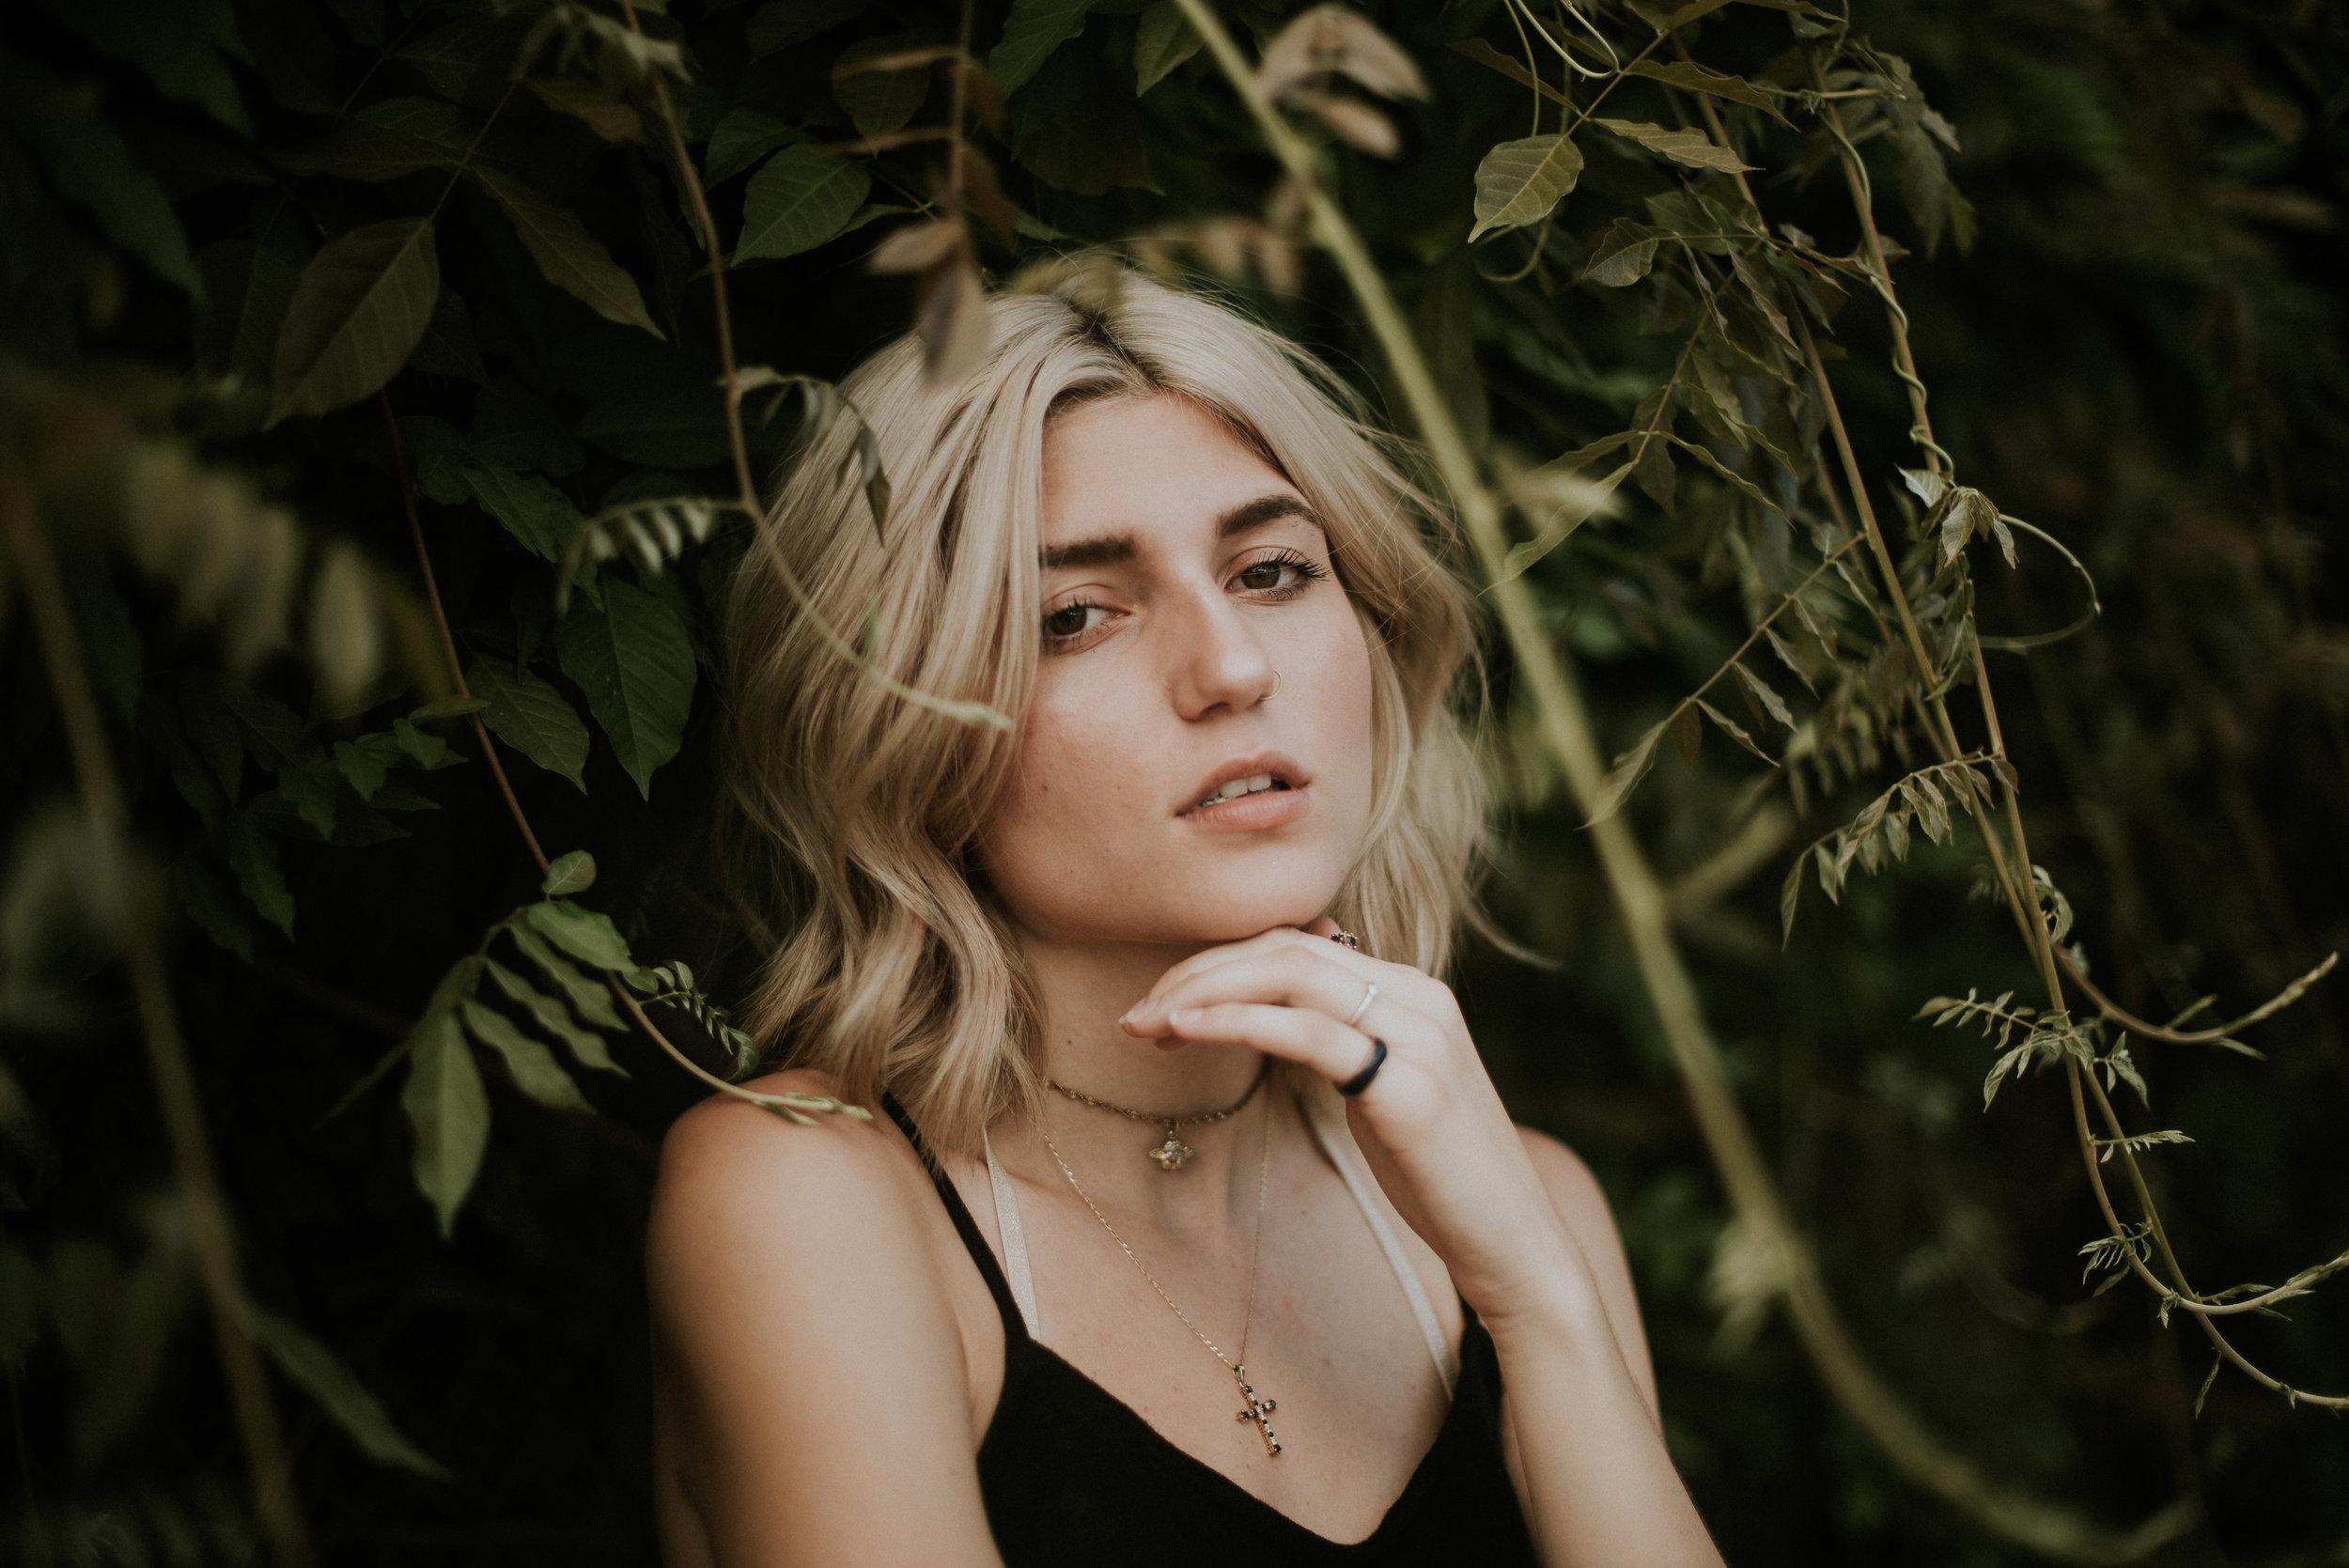 fashion model posing in greenery at atlanta styled shoot on krog street